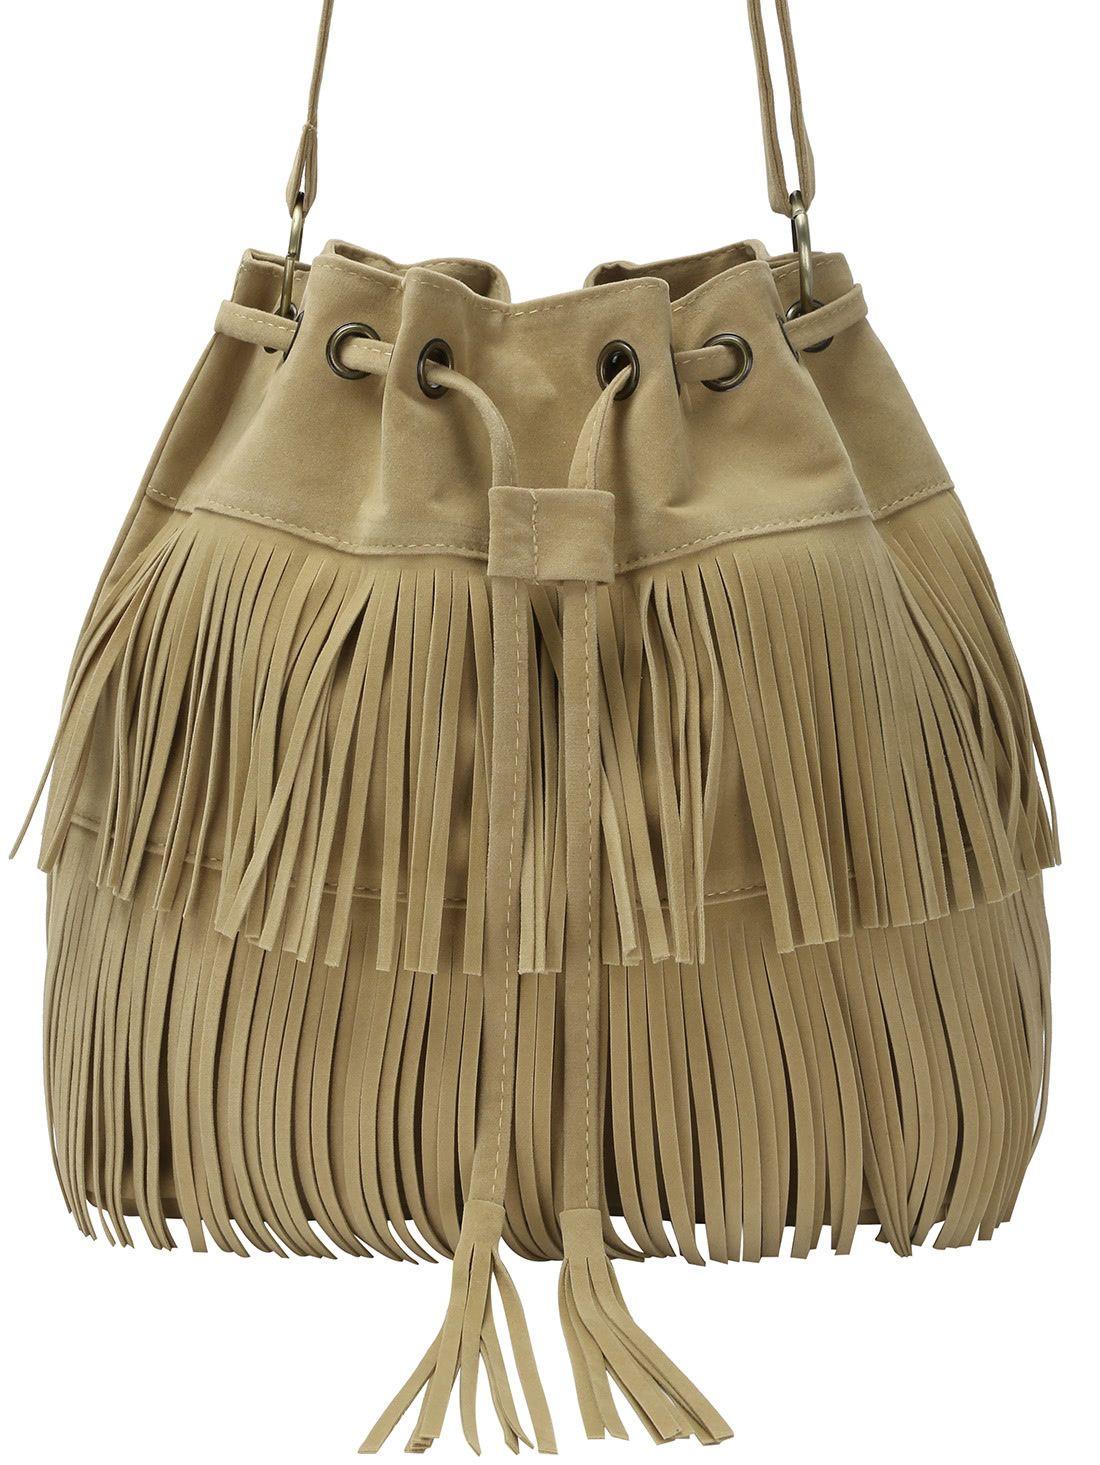 d39f0a9528d Khaki Fringe Eyelet Bag With Drawstring - Bag With Drawstring De Color  Caqui